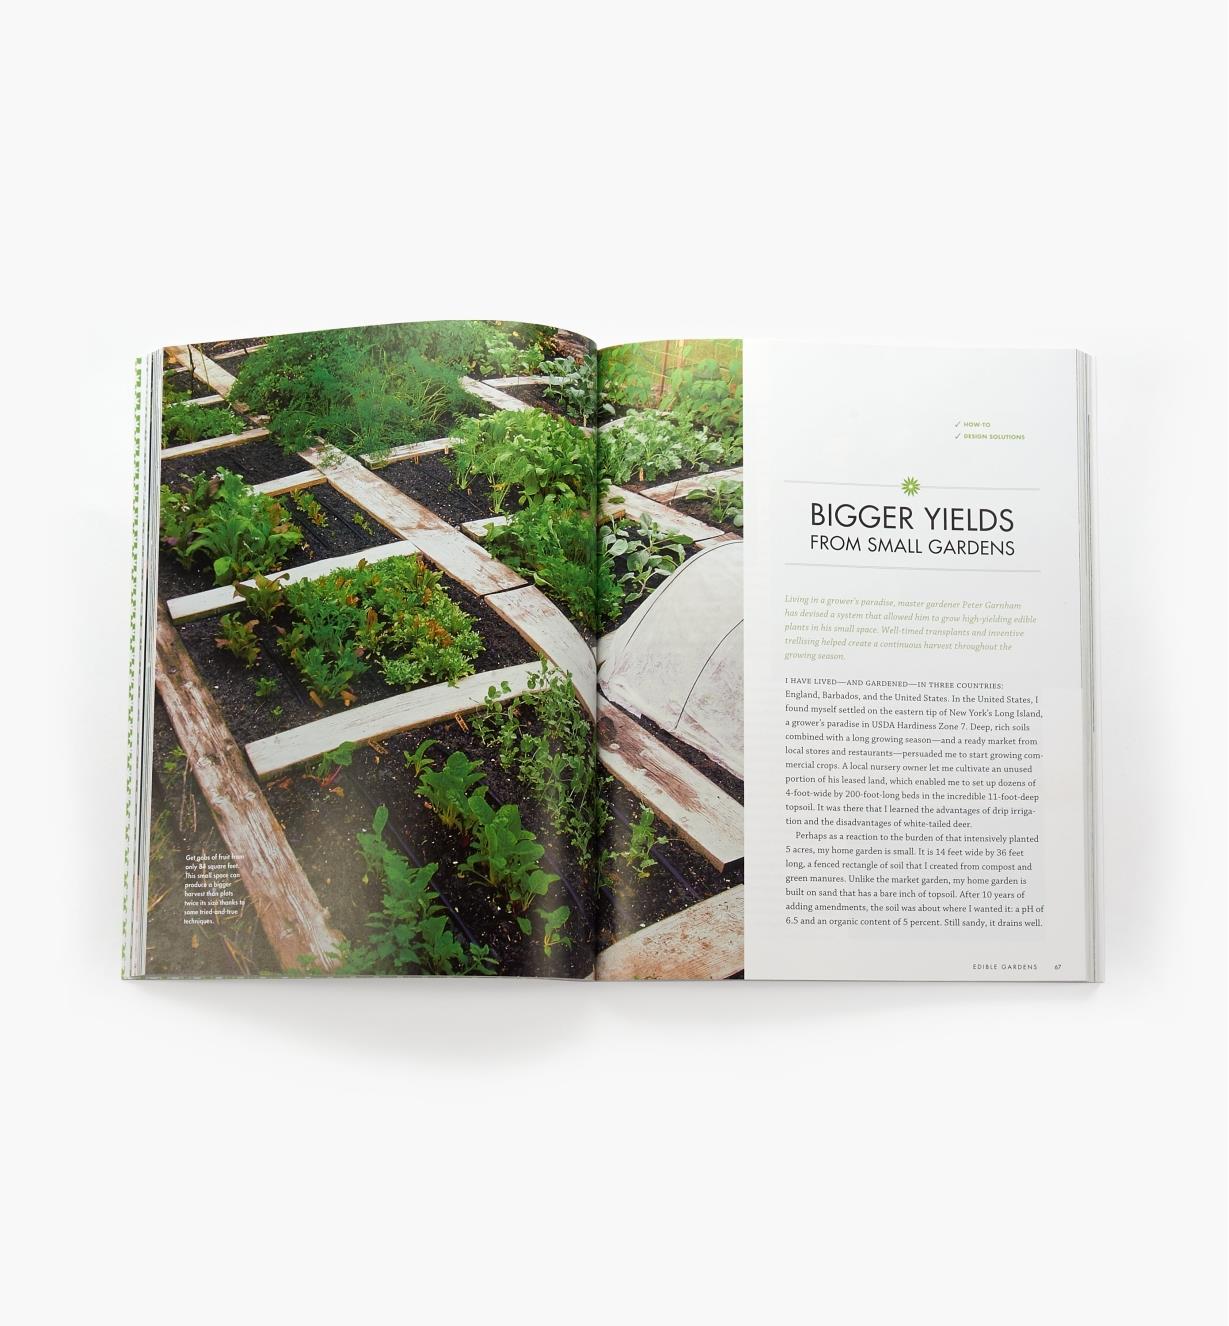 LA848 - Pocket Gardens